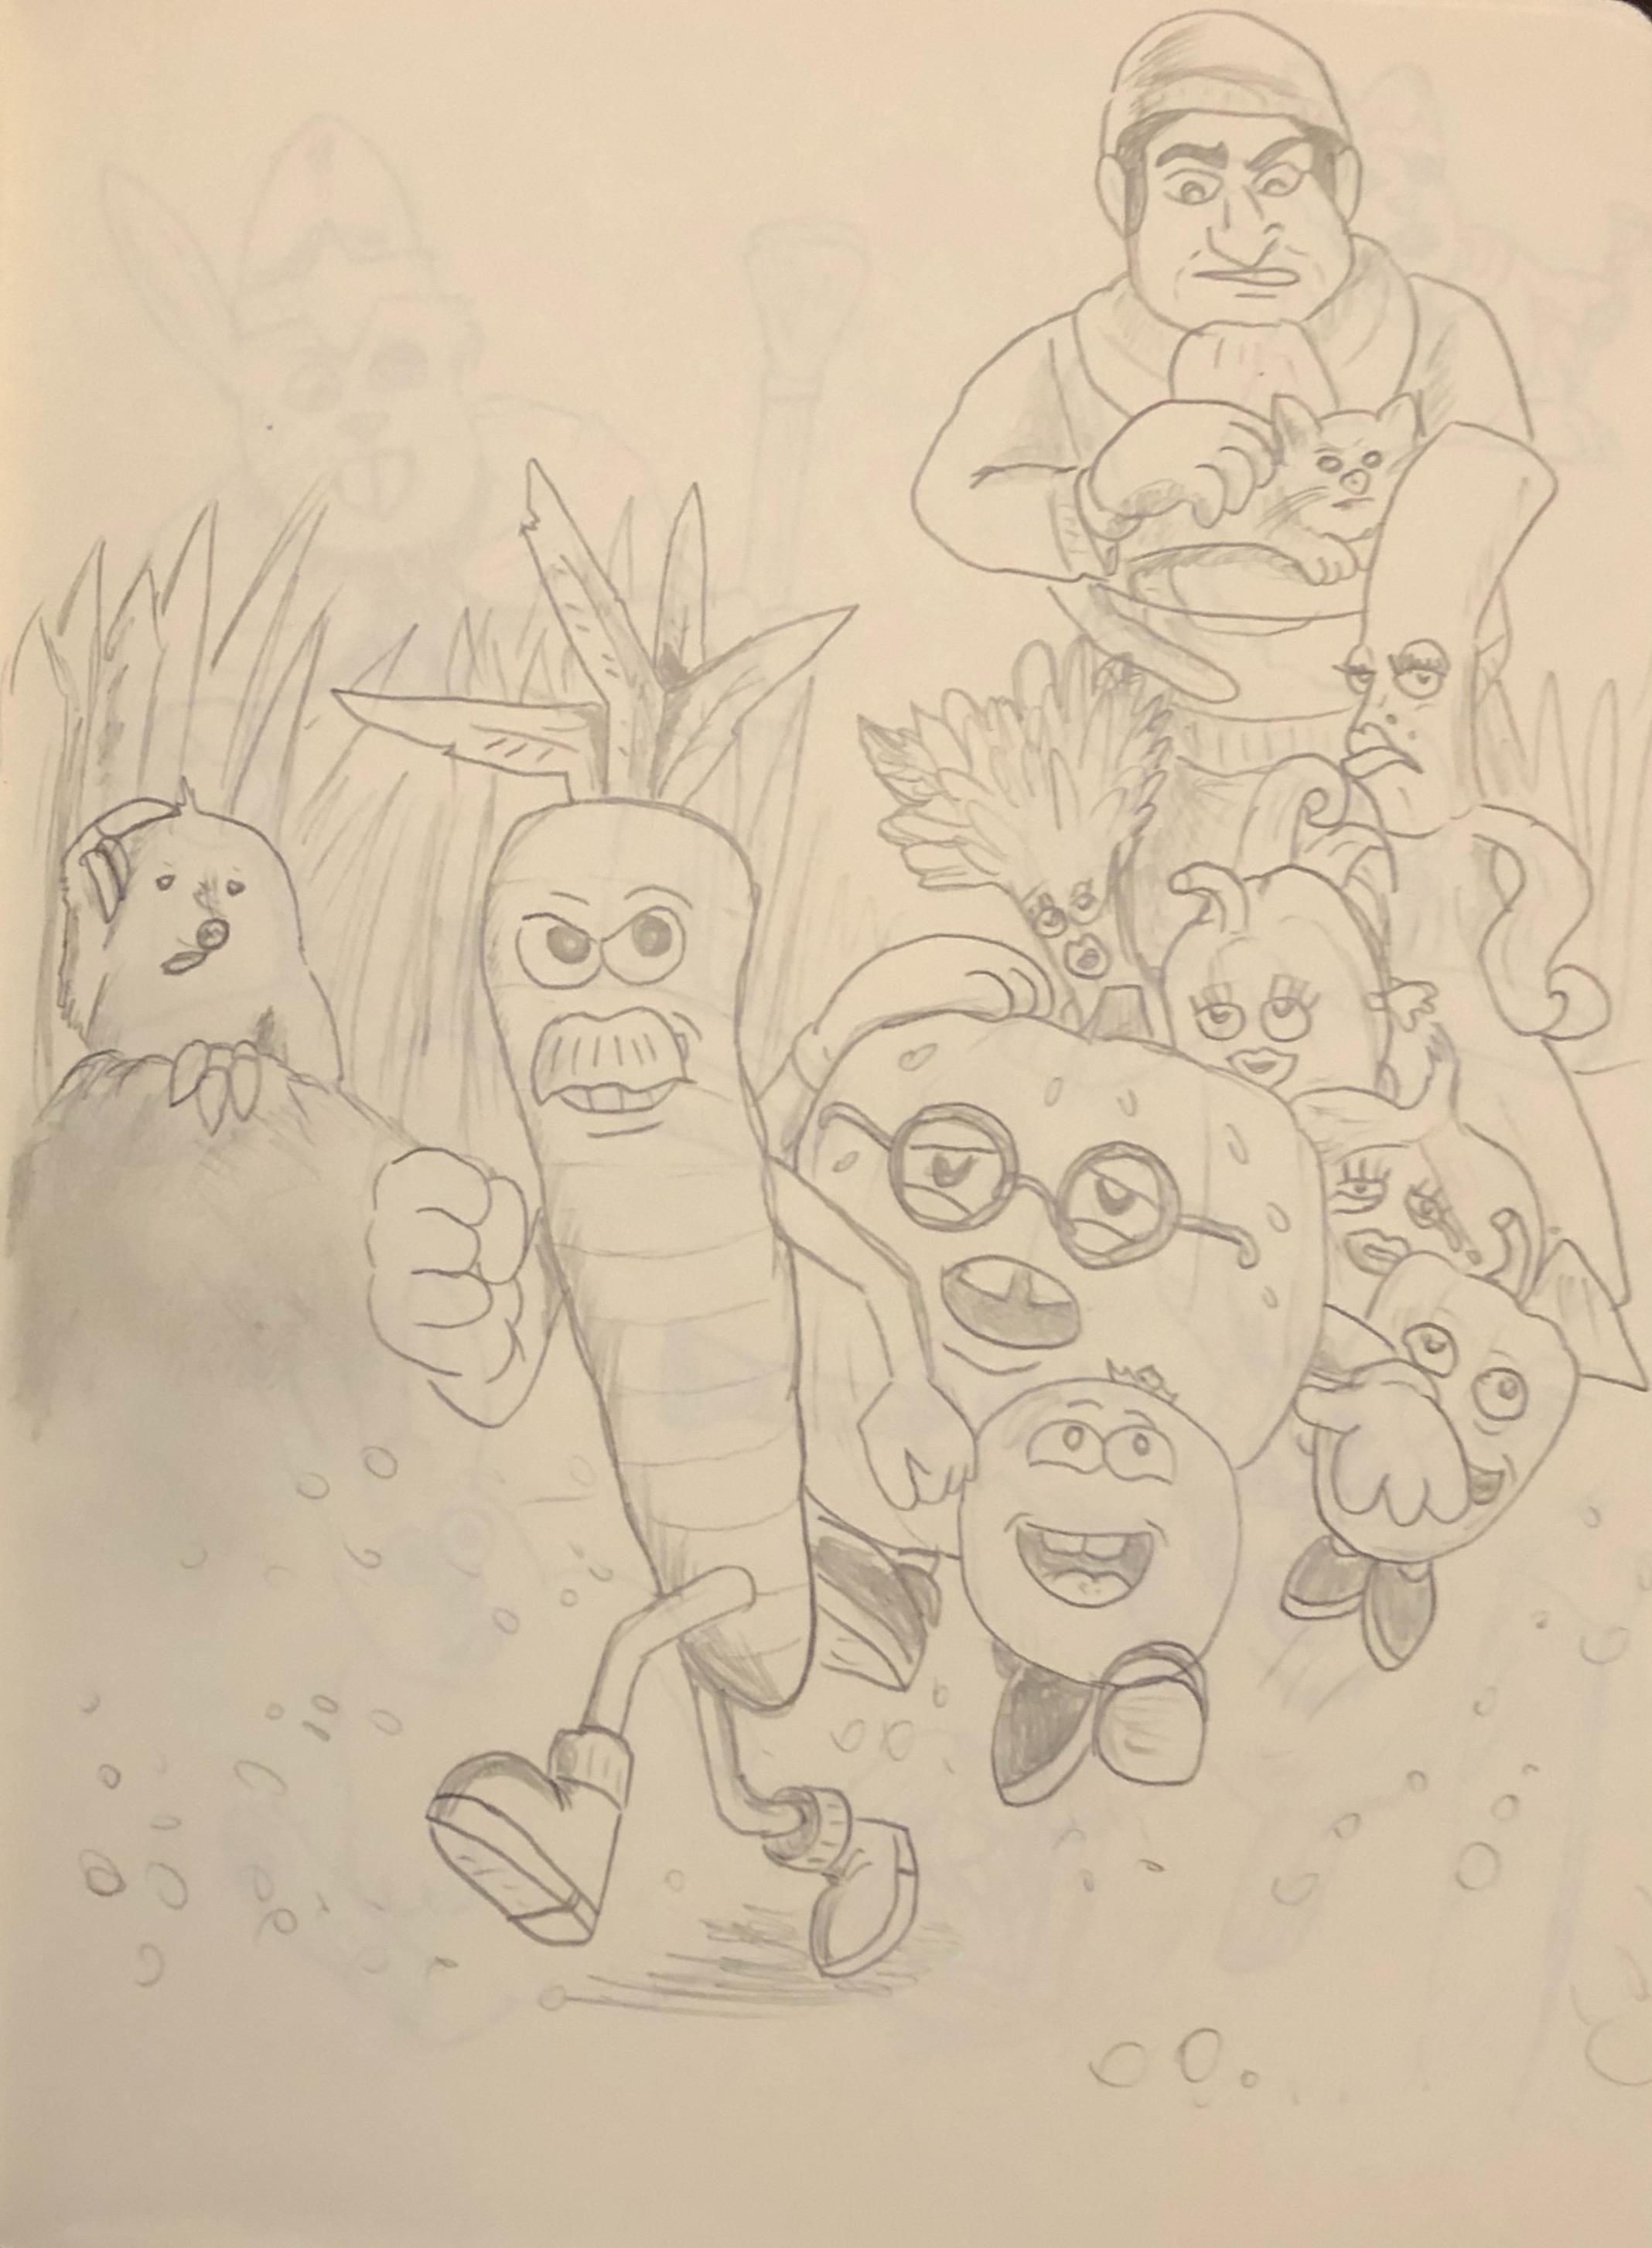 The original sketch drawing of Veggie Ru